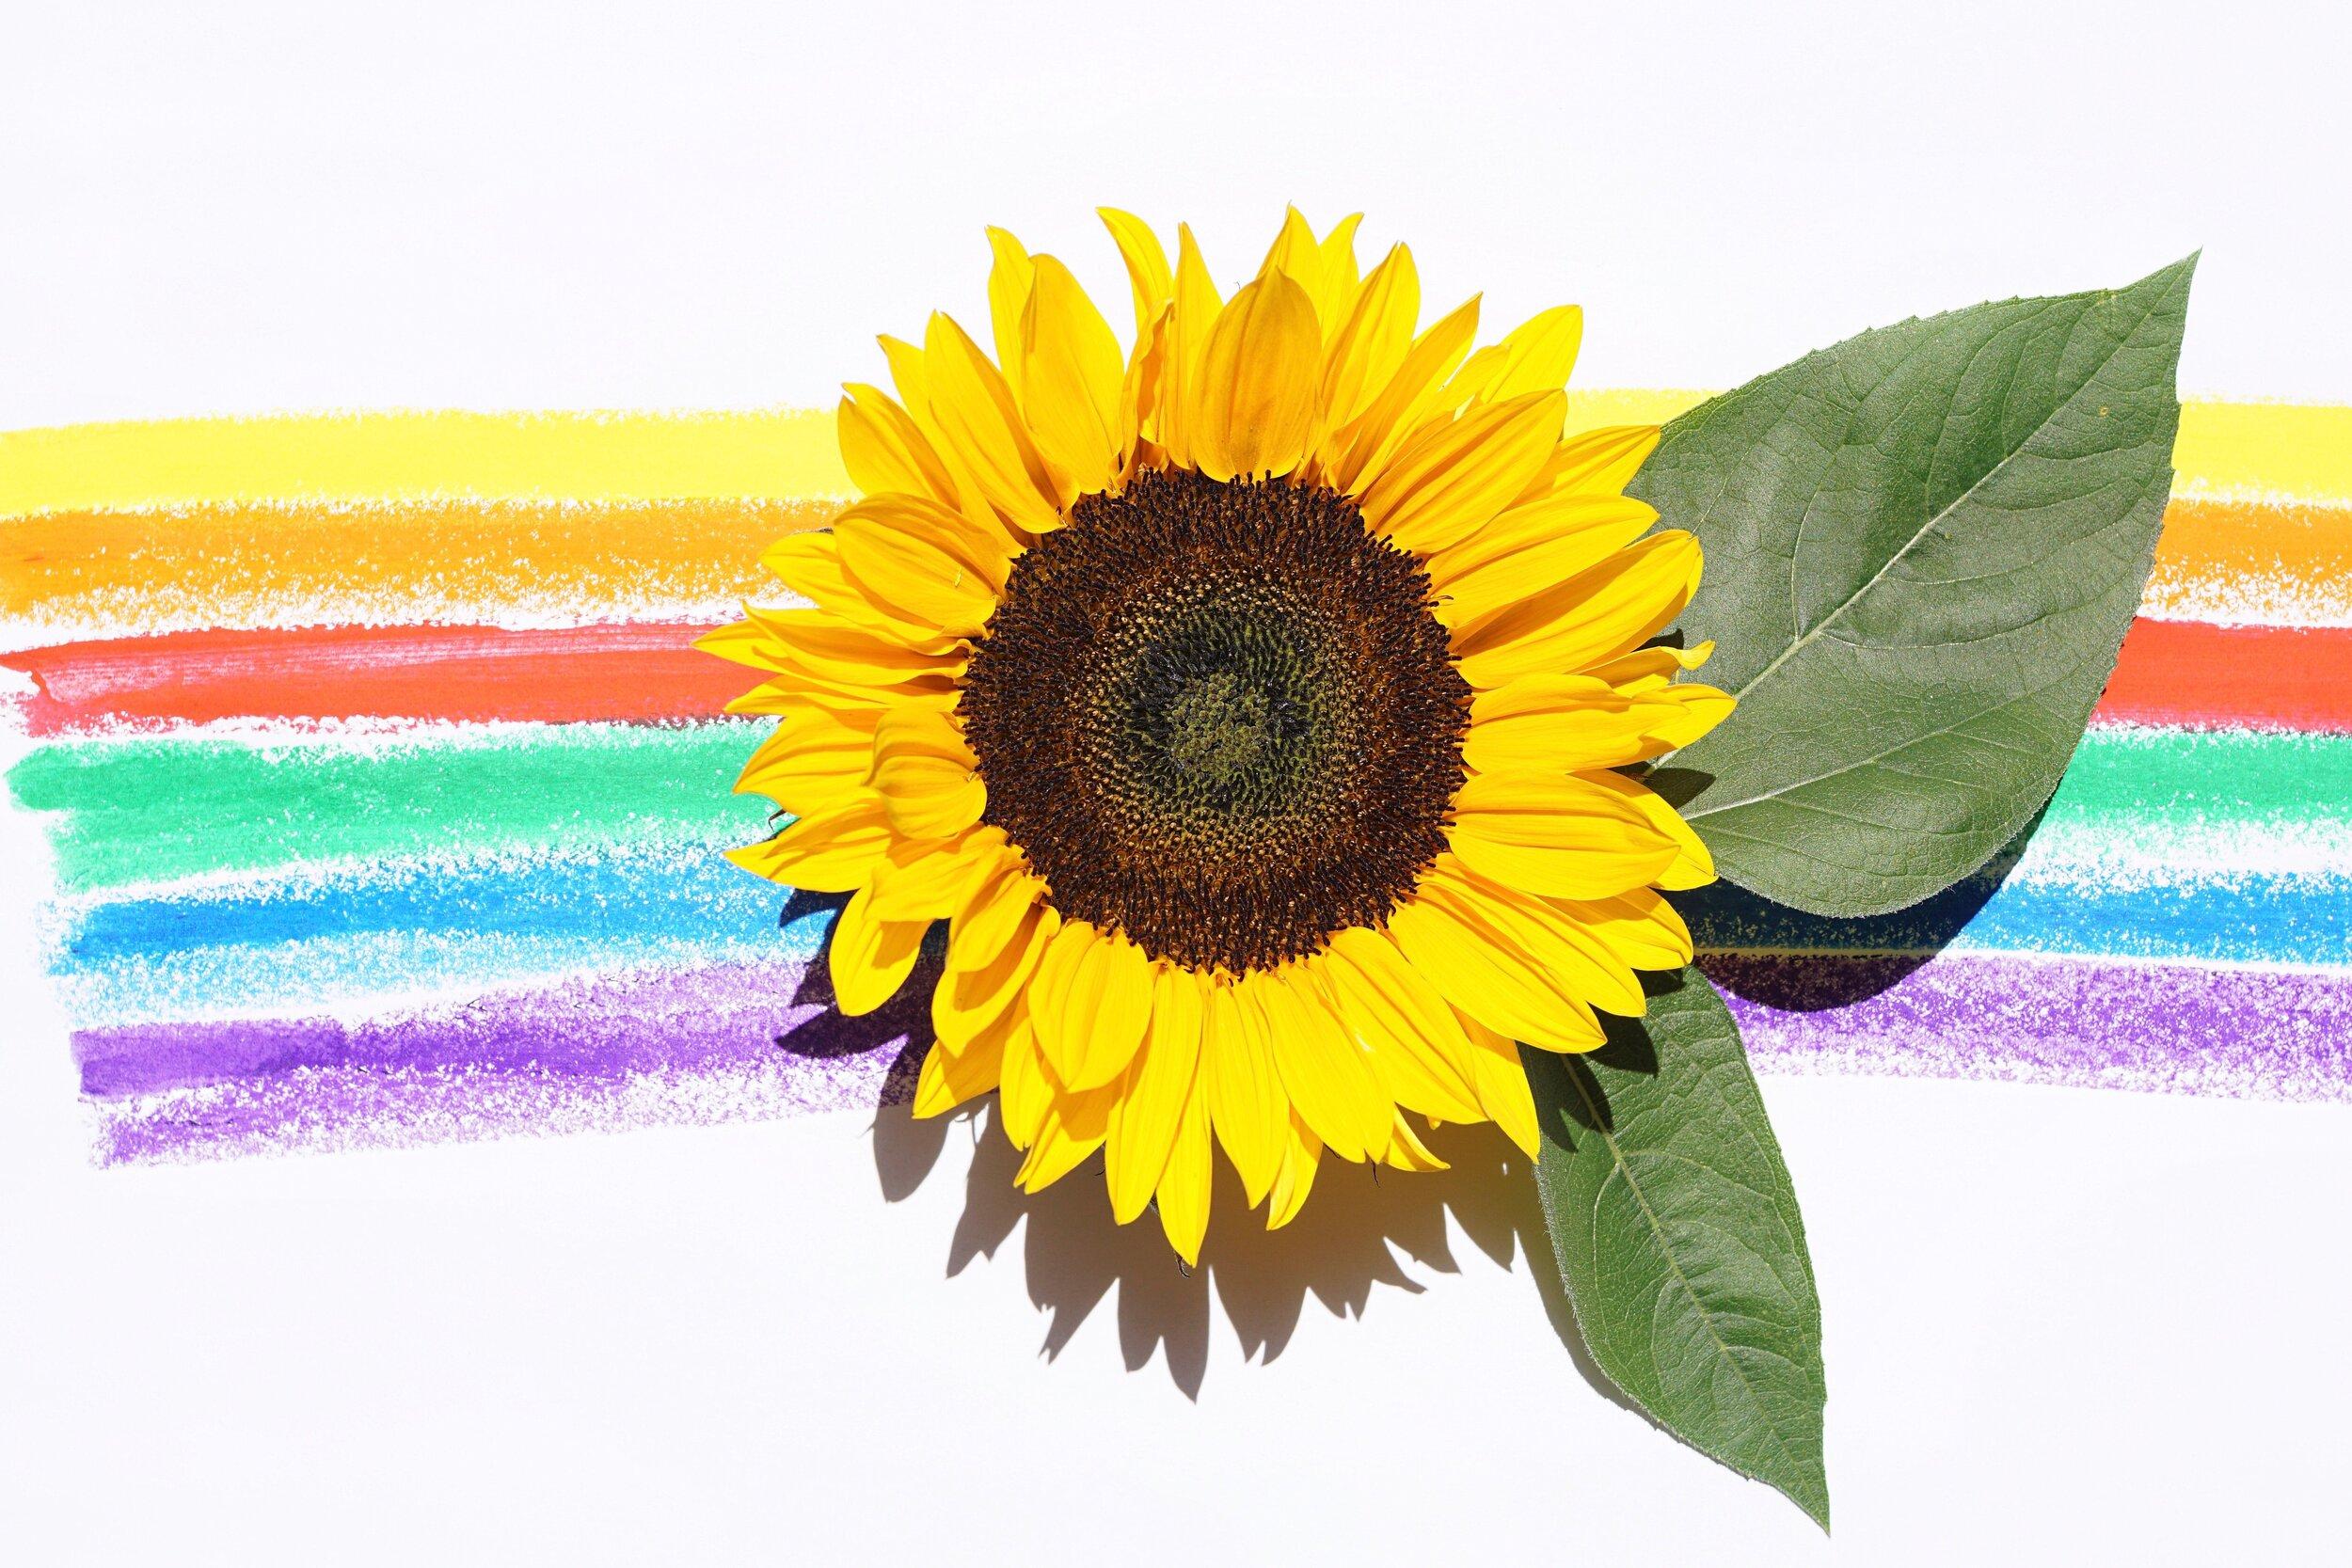 Sunflower Seed Oil